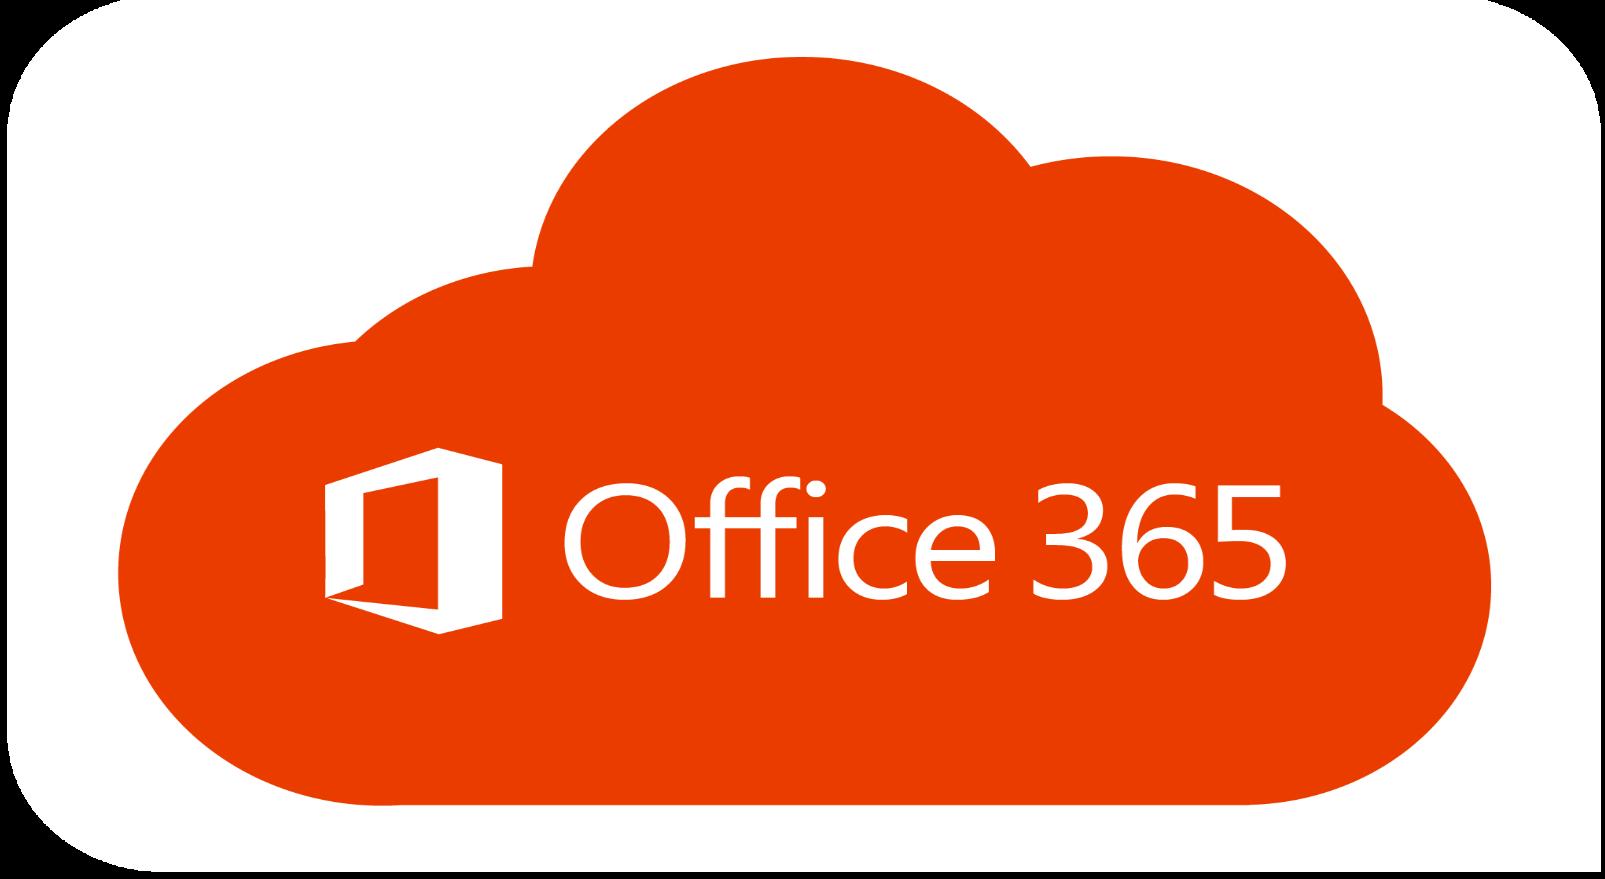 Фотография 👔 office 365 proplus +5tb onedrive [ 💳 доступна ✅ ]